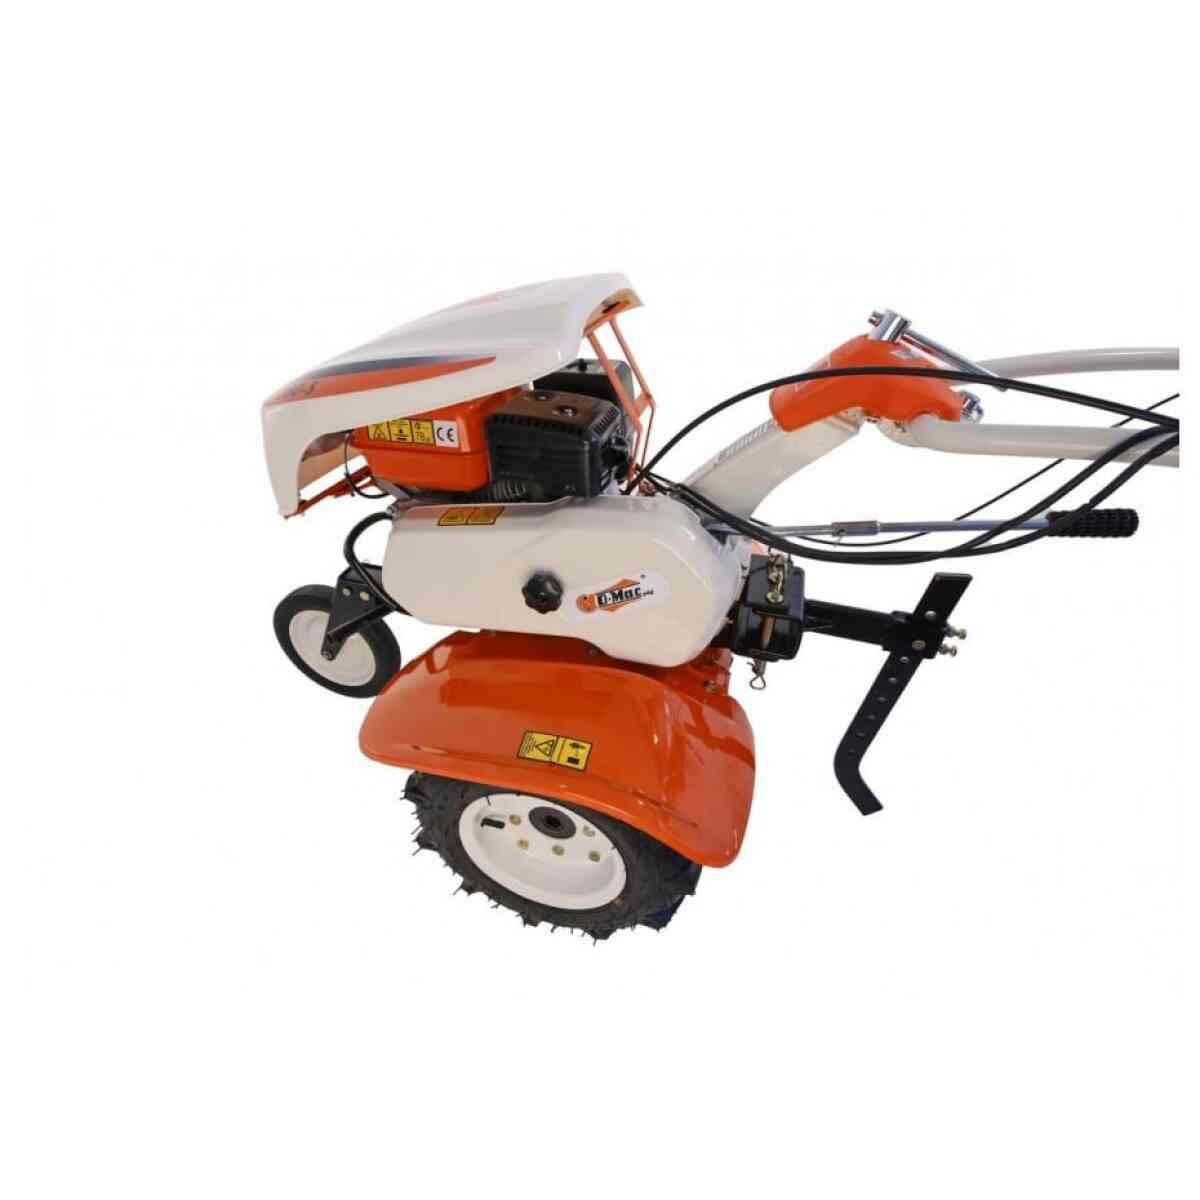 motocultor o mac 750s o mac.ro 009 1 39